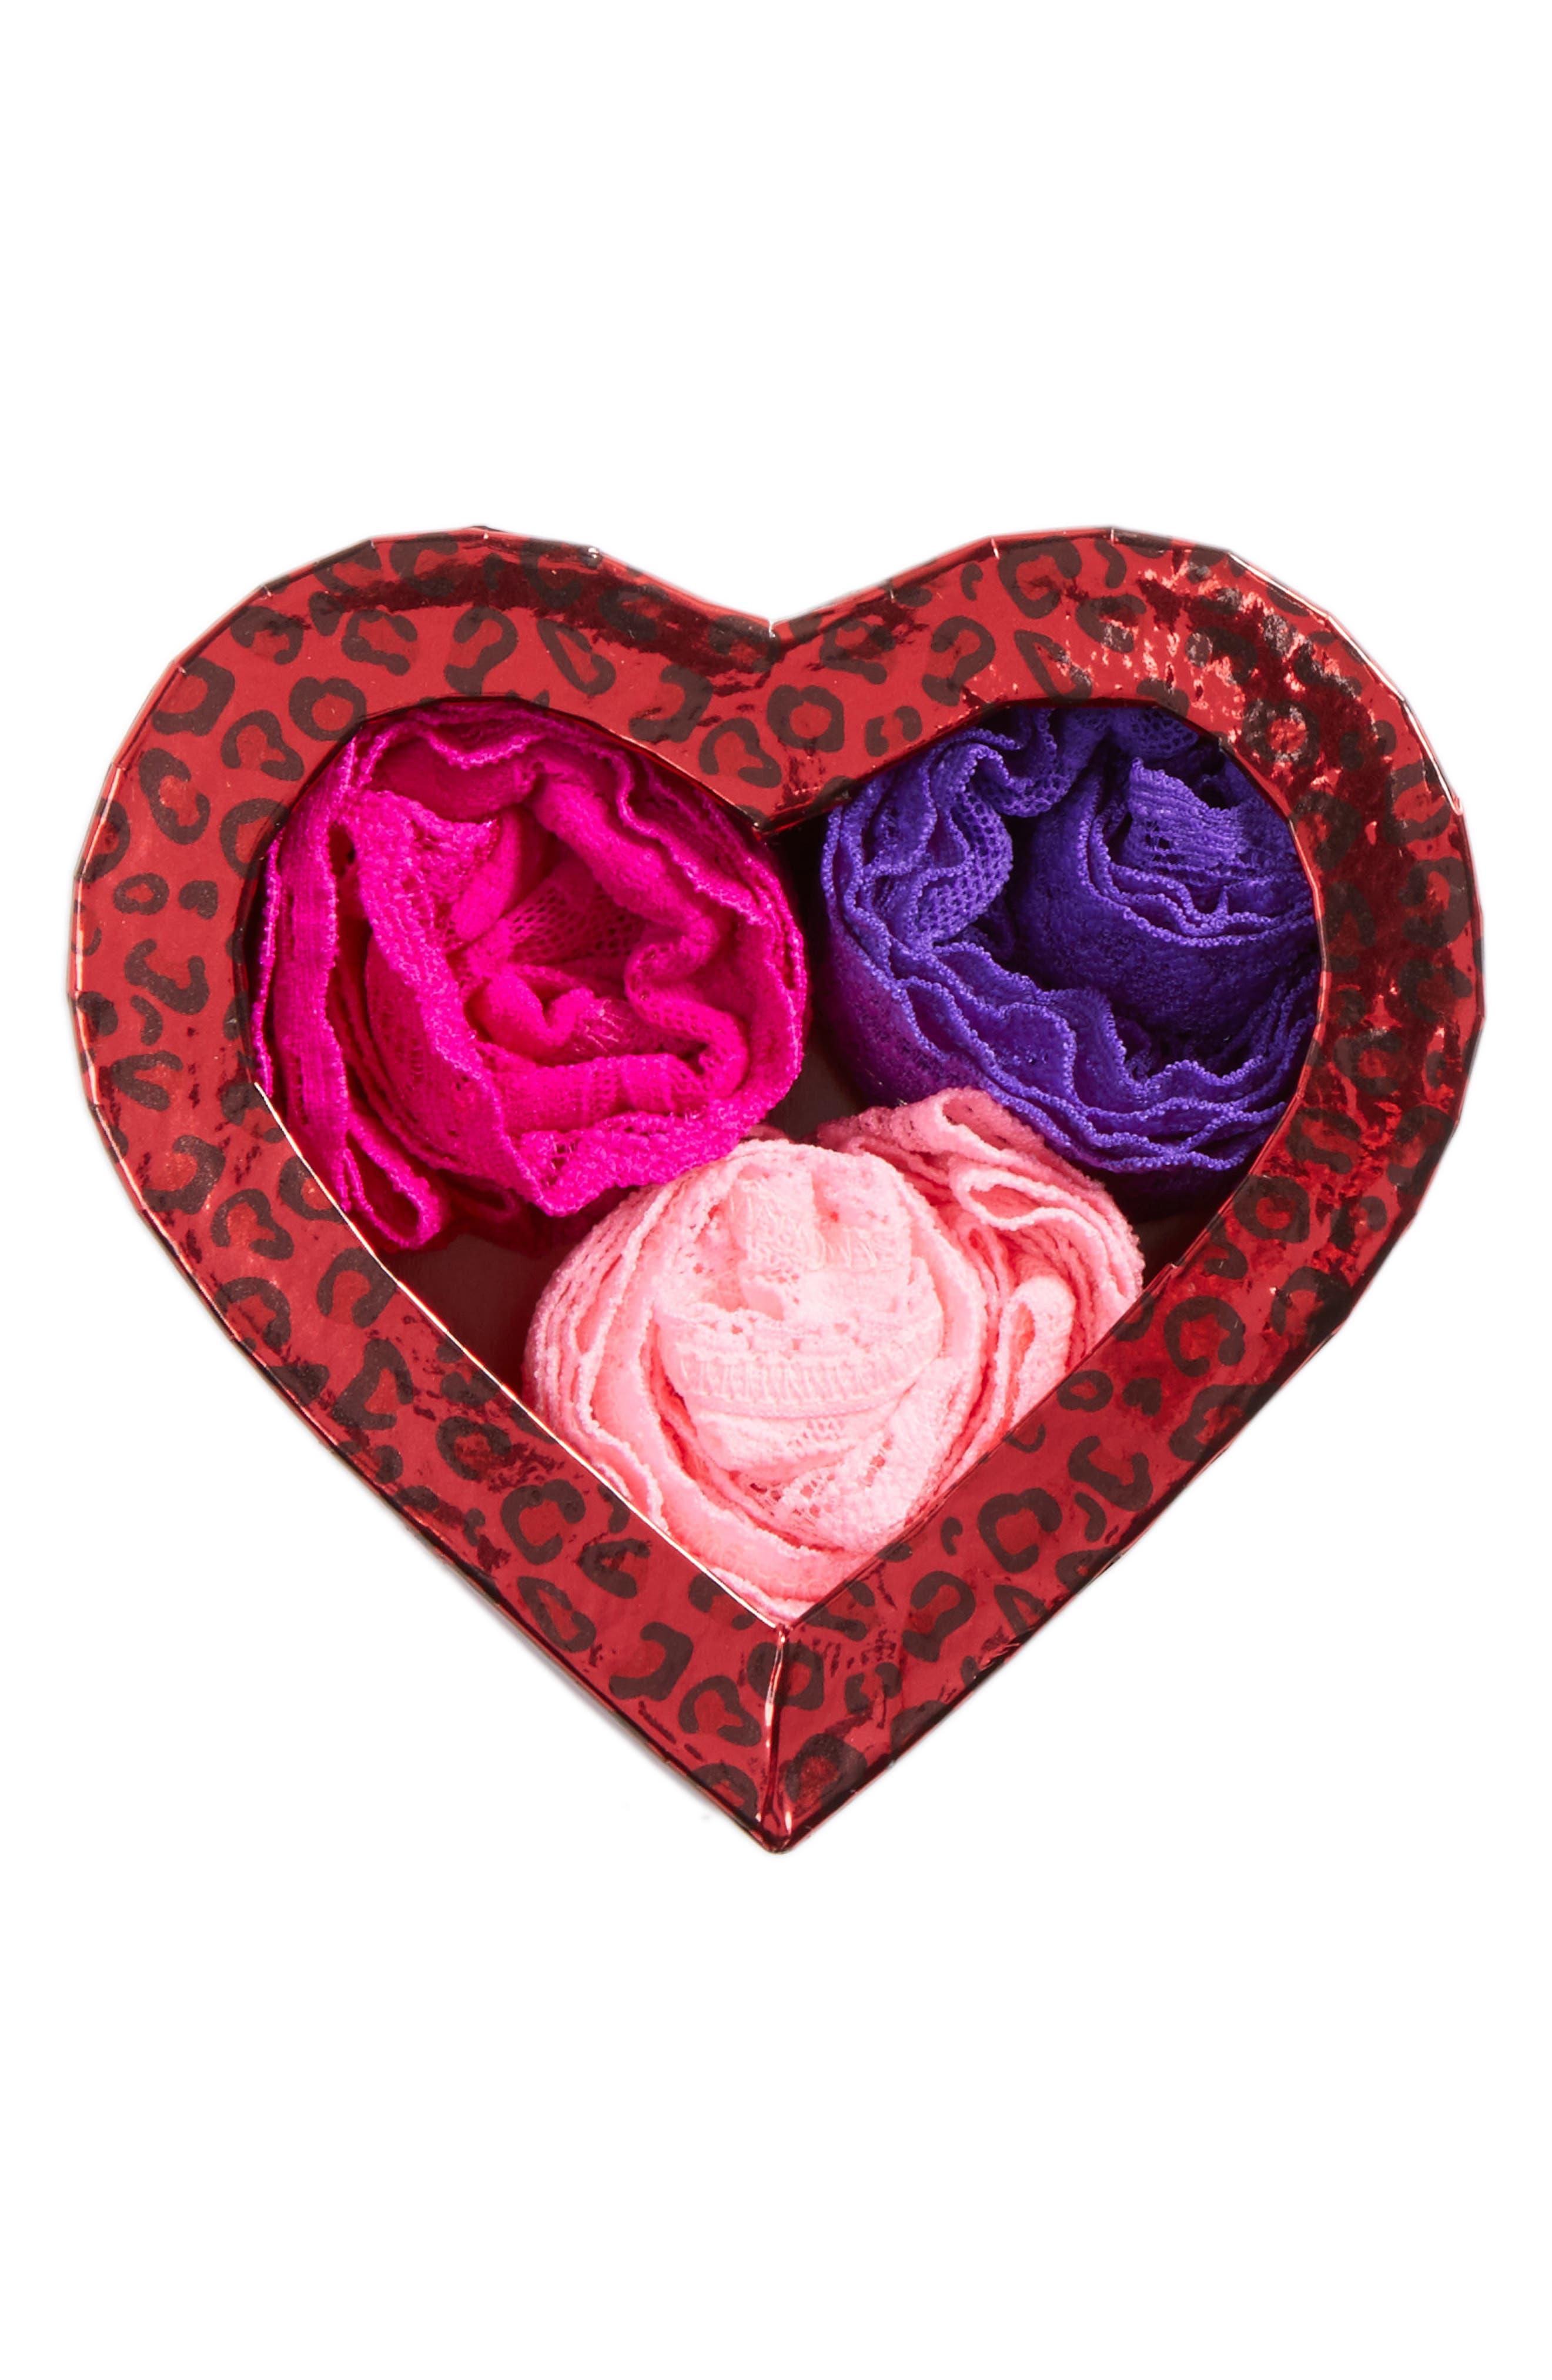 'Hugs N Kisses' Boxed Low Rise Thongs,                         Main,                         color, Cherry Blossom/ Royal